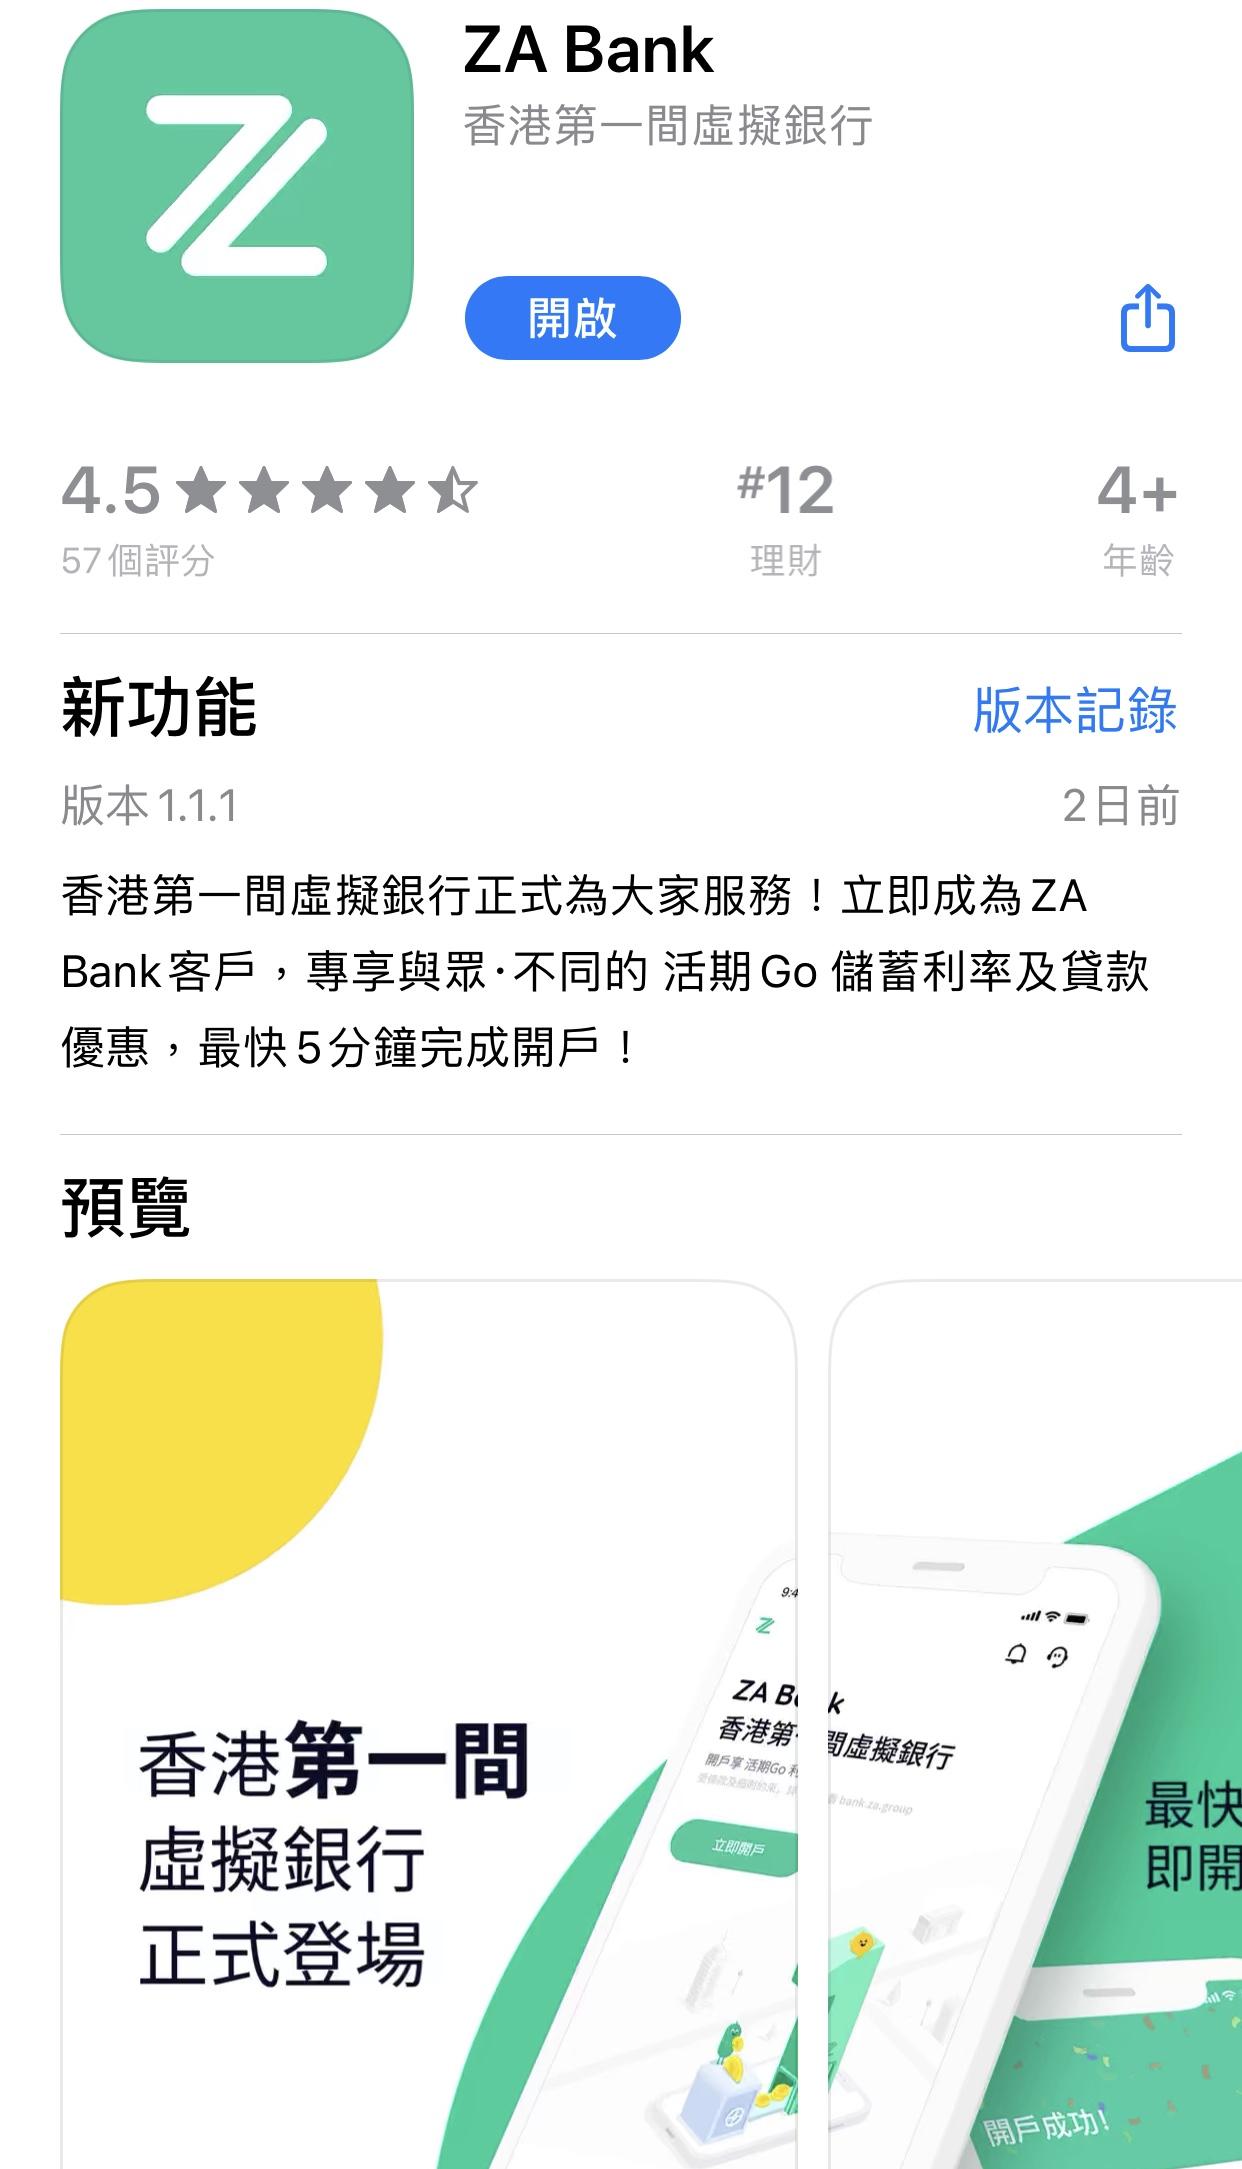 ZA Bank 額外HK$100邀請碼:「V42646」!全港第一虛擬銀行!!用 ZA Card 購物高達200%回贈!活期息都有1%p.a. 呀!插图1